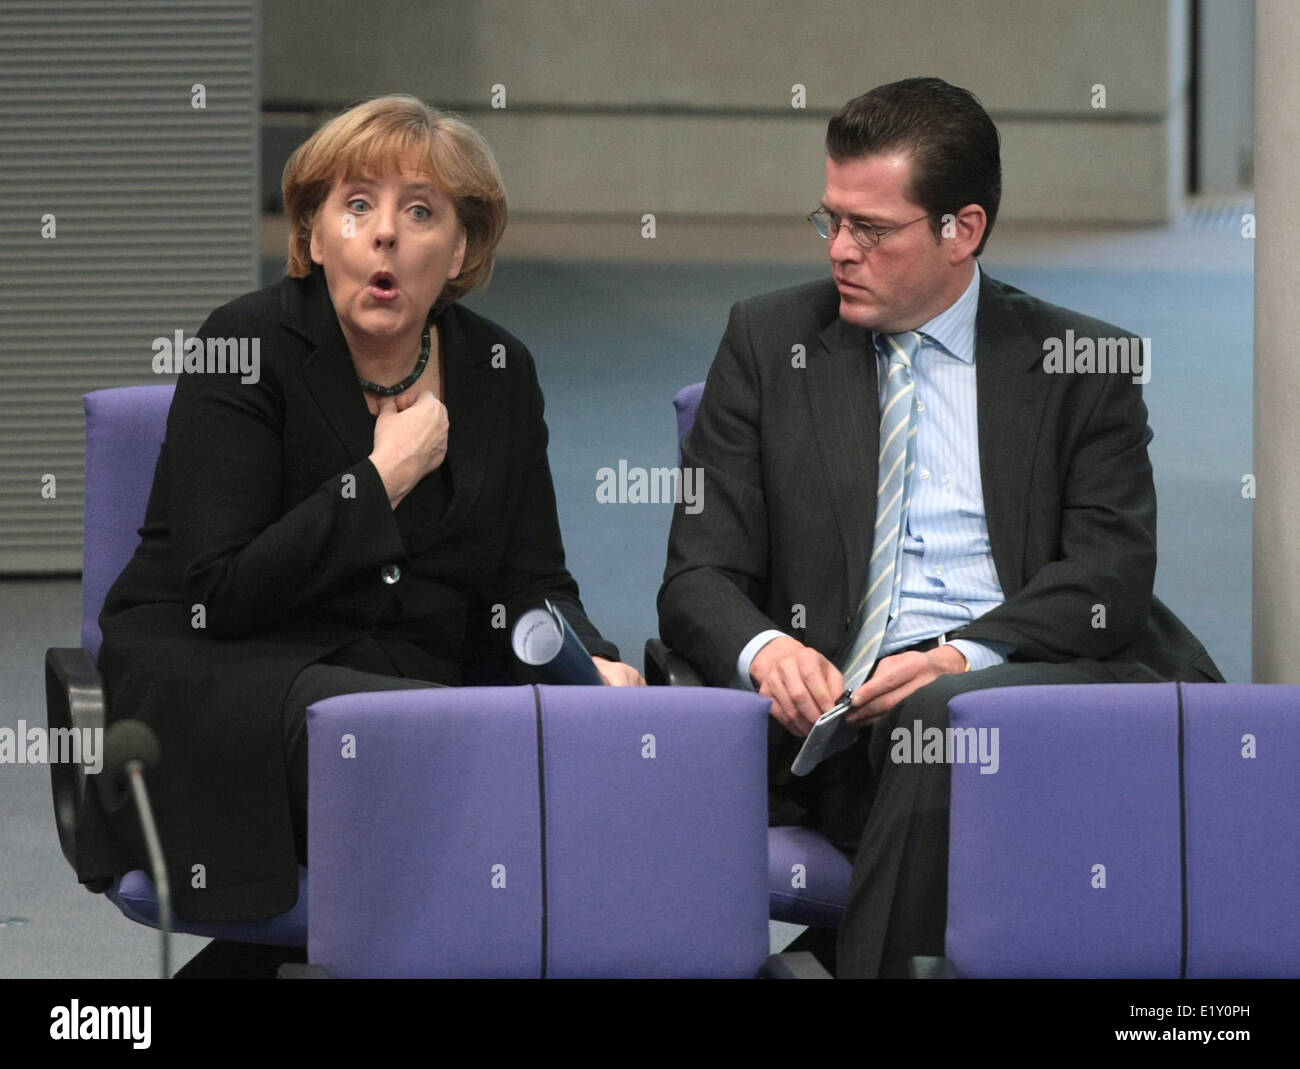 Chancellor Angela Merkel (CDU) talks to Federal minister of economics Karl-Theodor zu Guttenberg (19.03.2009). Foto: - Stock Image